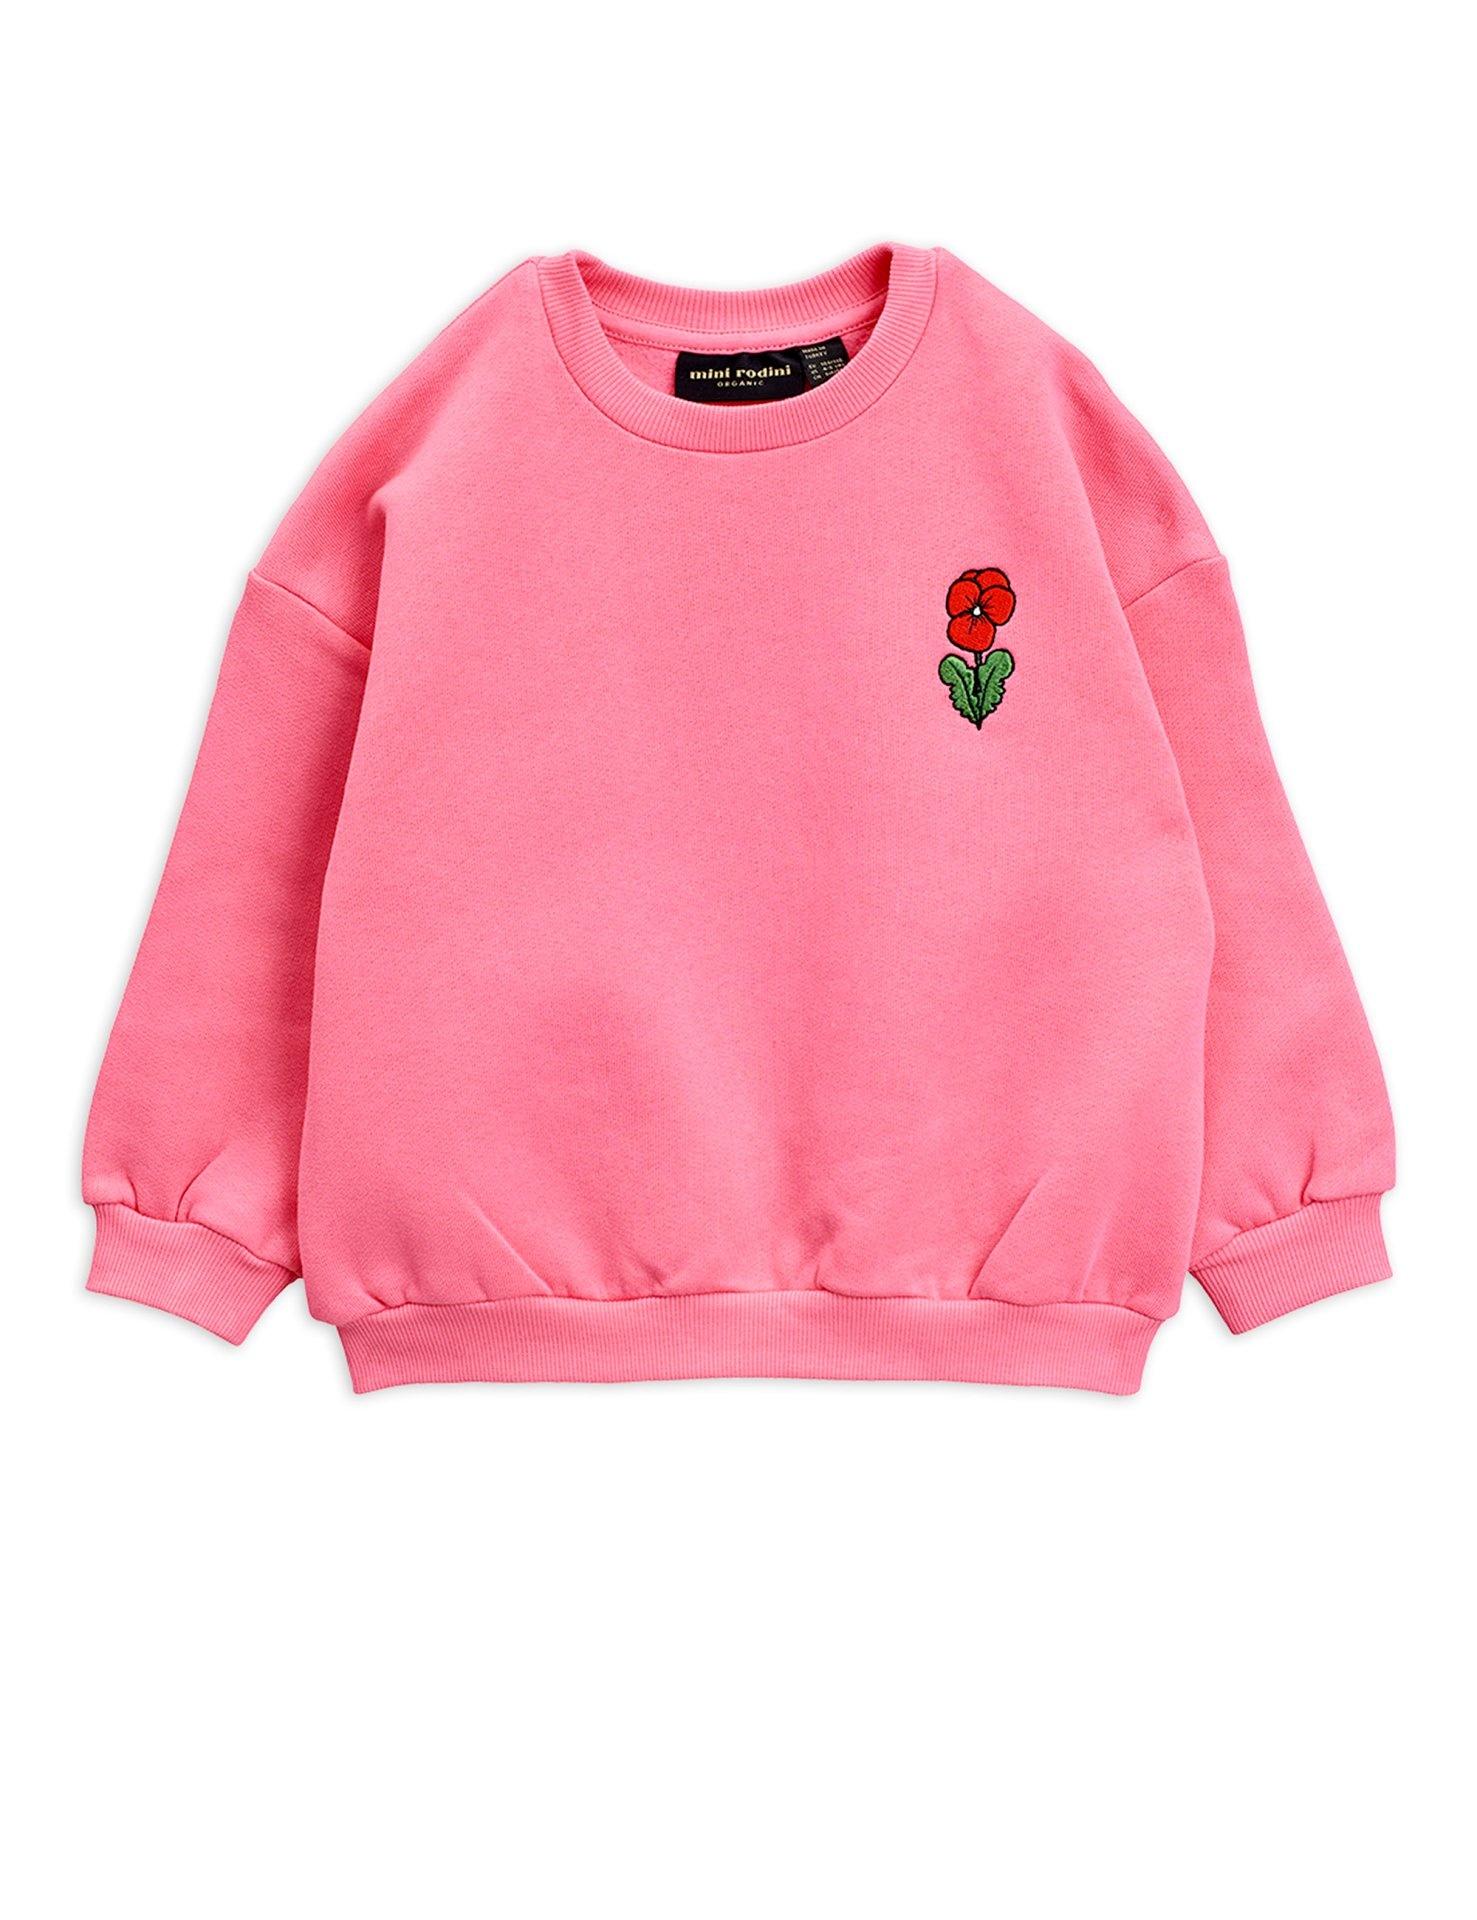 Viola emb sweatshirt - Pink-1